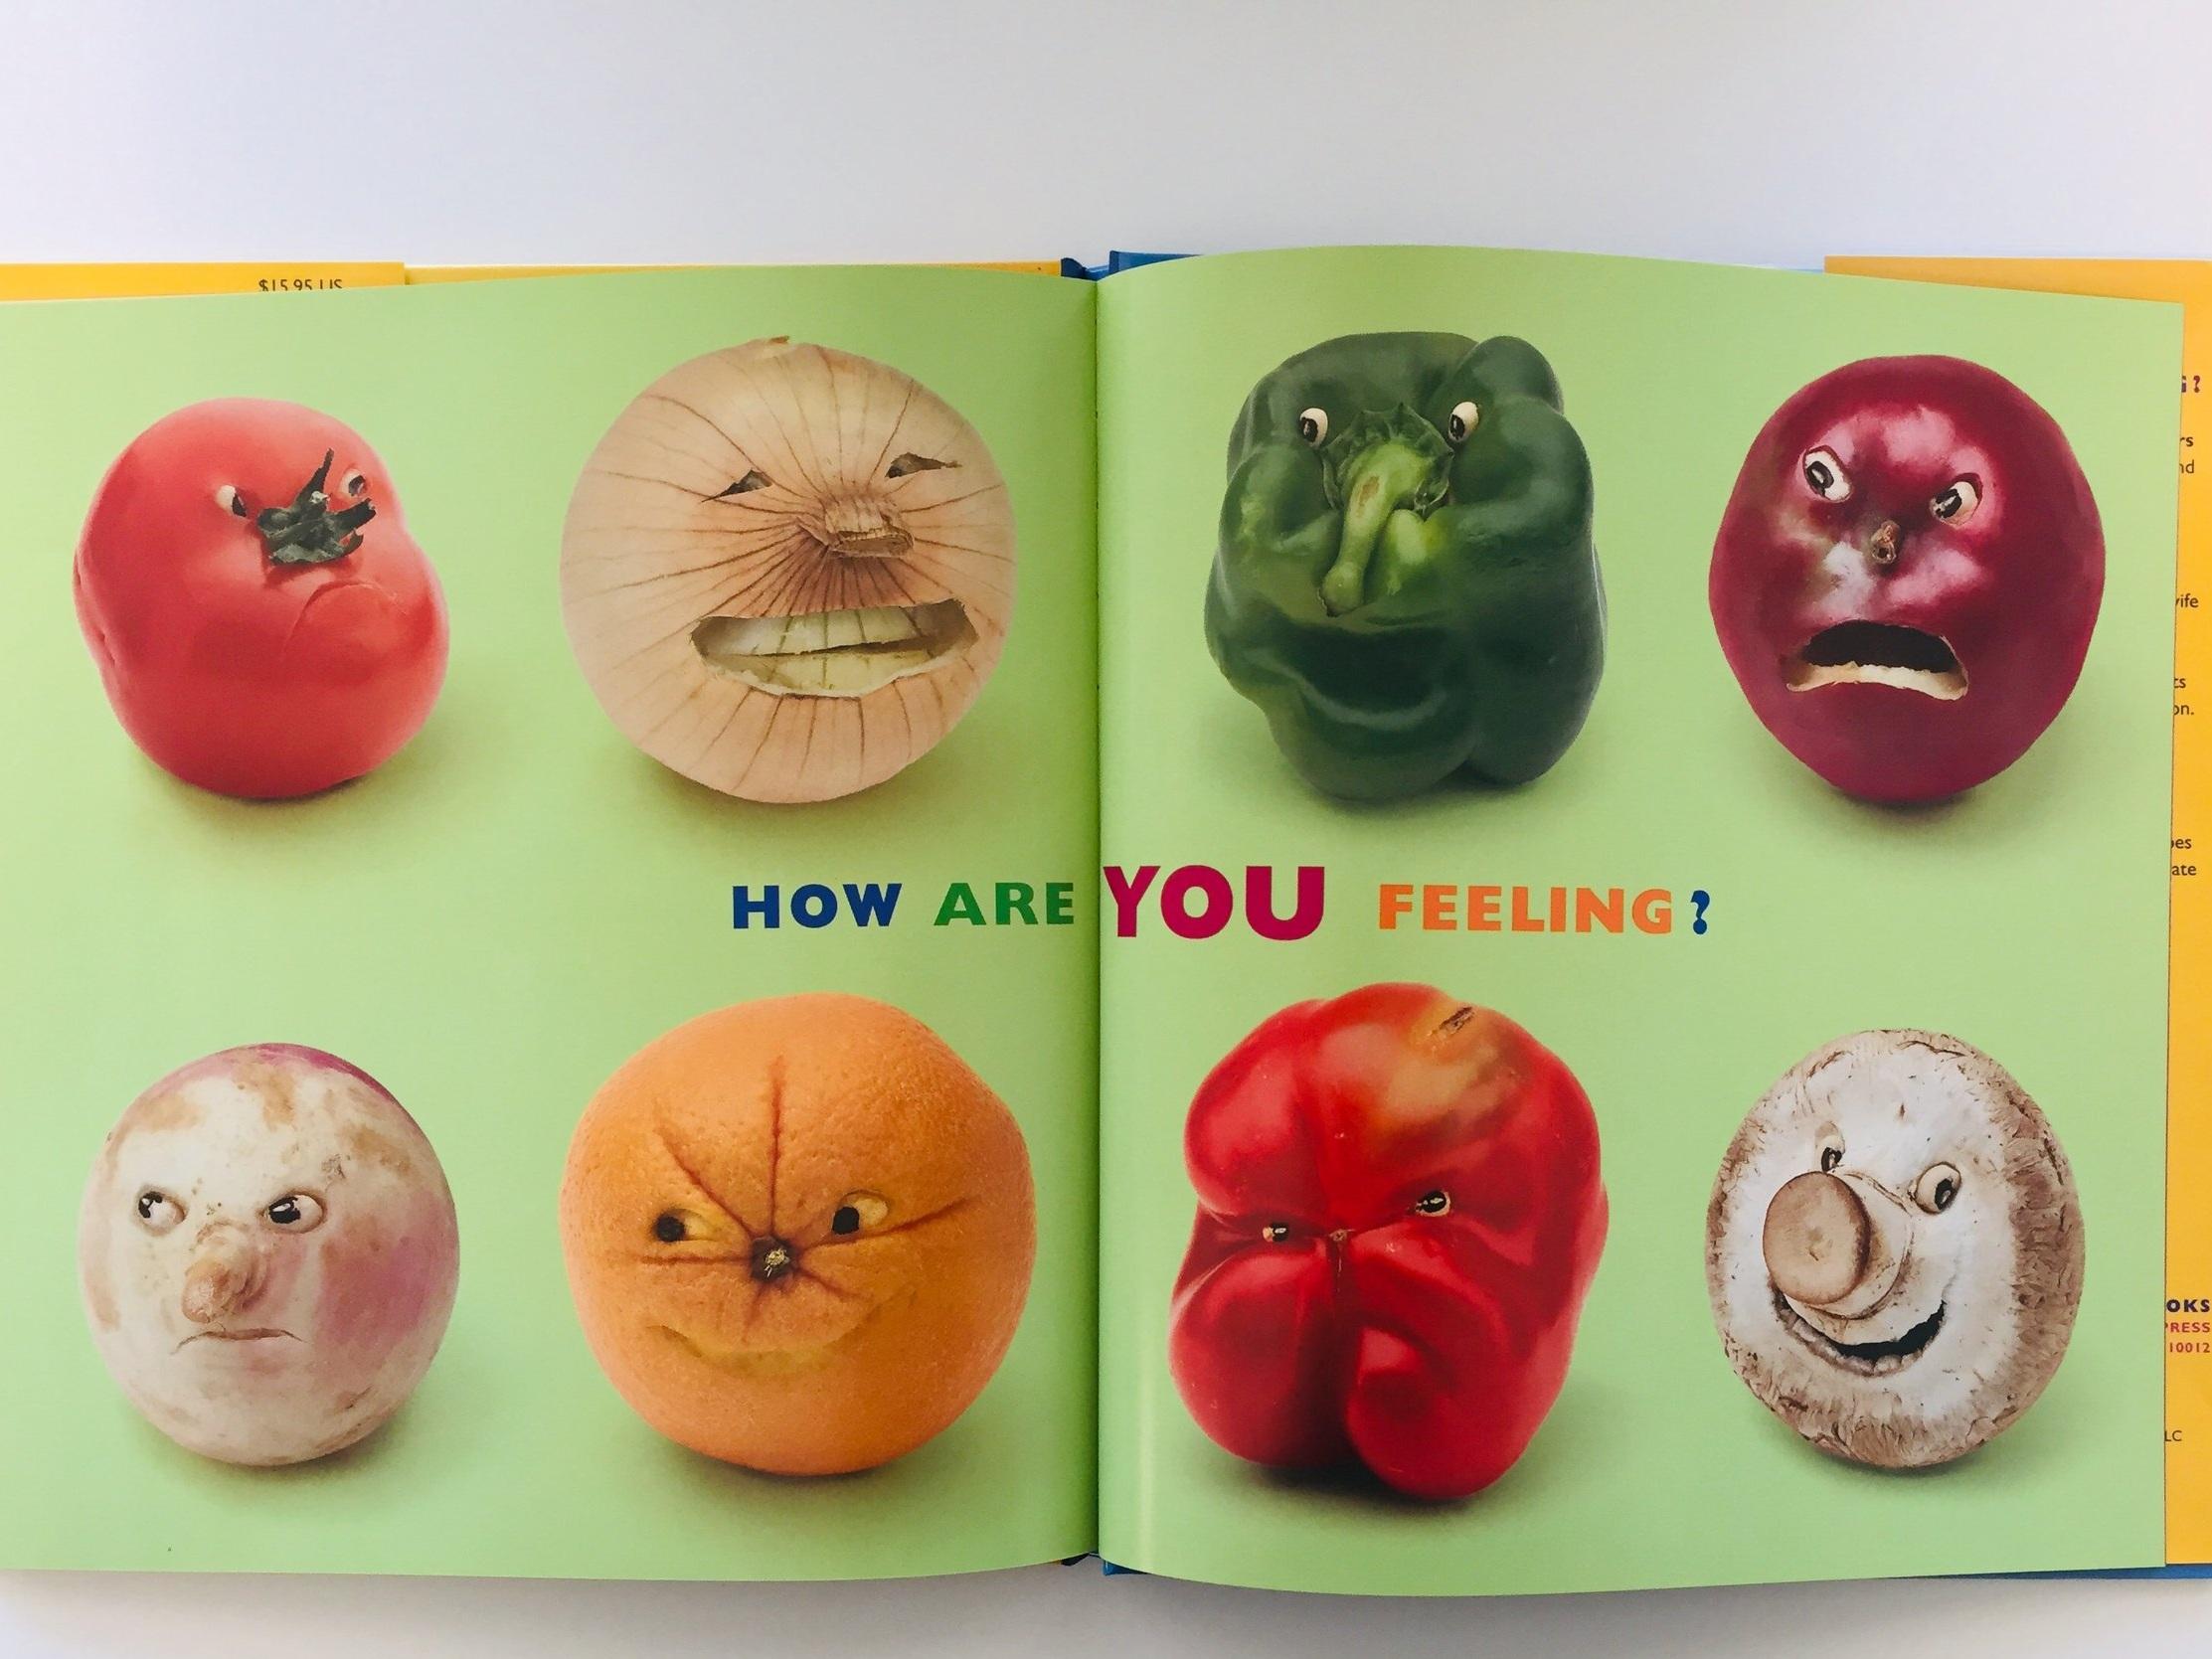 How Are You Peeling?  - Saxton Freymann & Joost Elffers